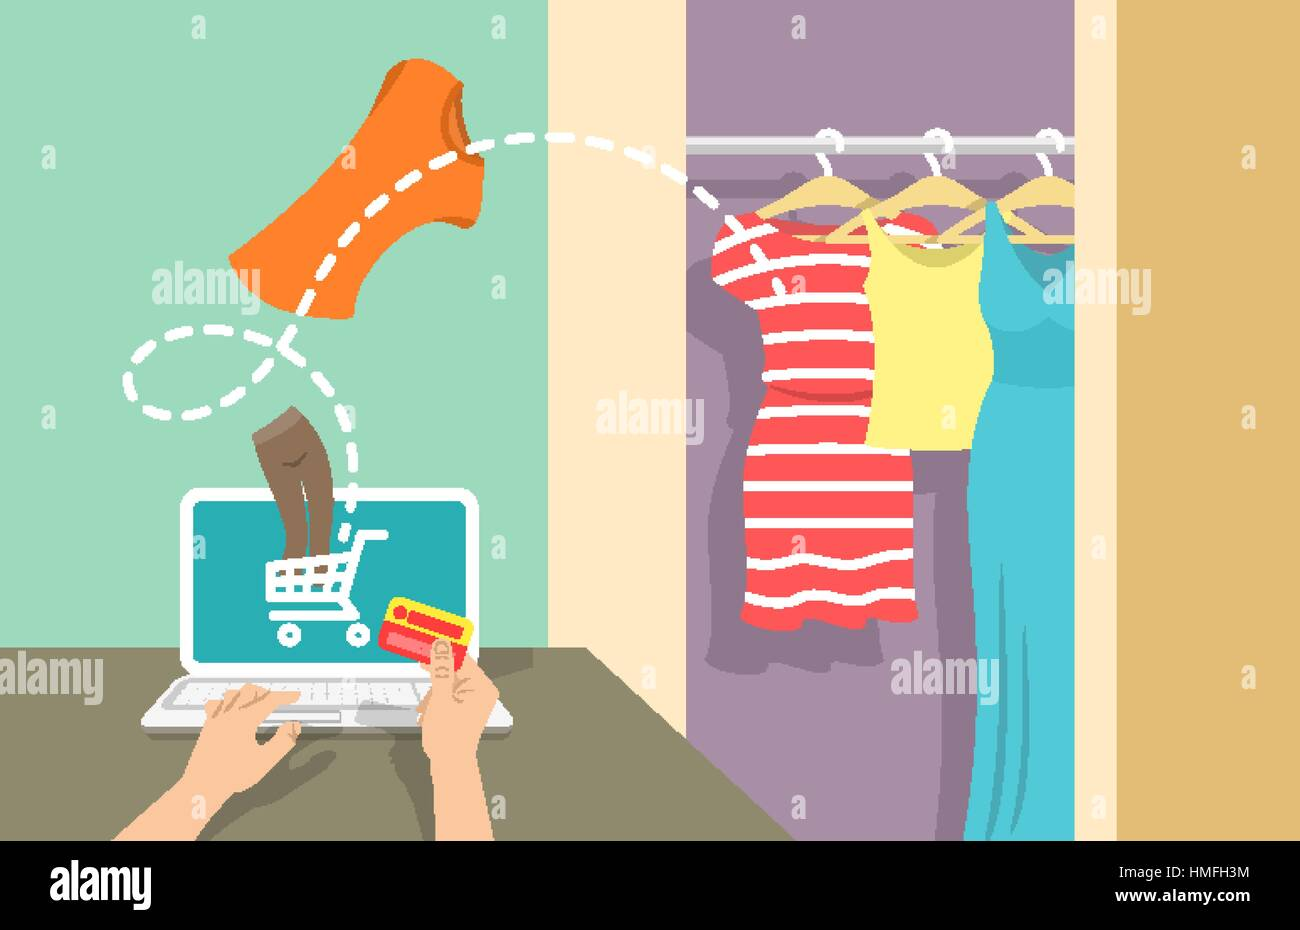 Online Shopping Flat Vector Banner Web Store Marketing Concept Stock Vector Image Art Alamy